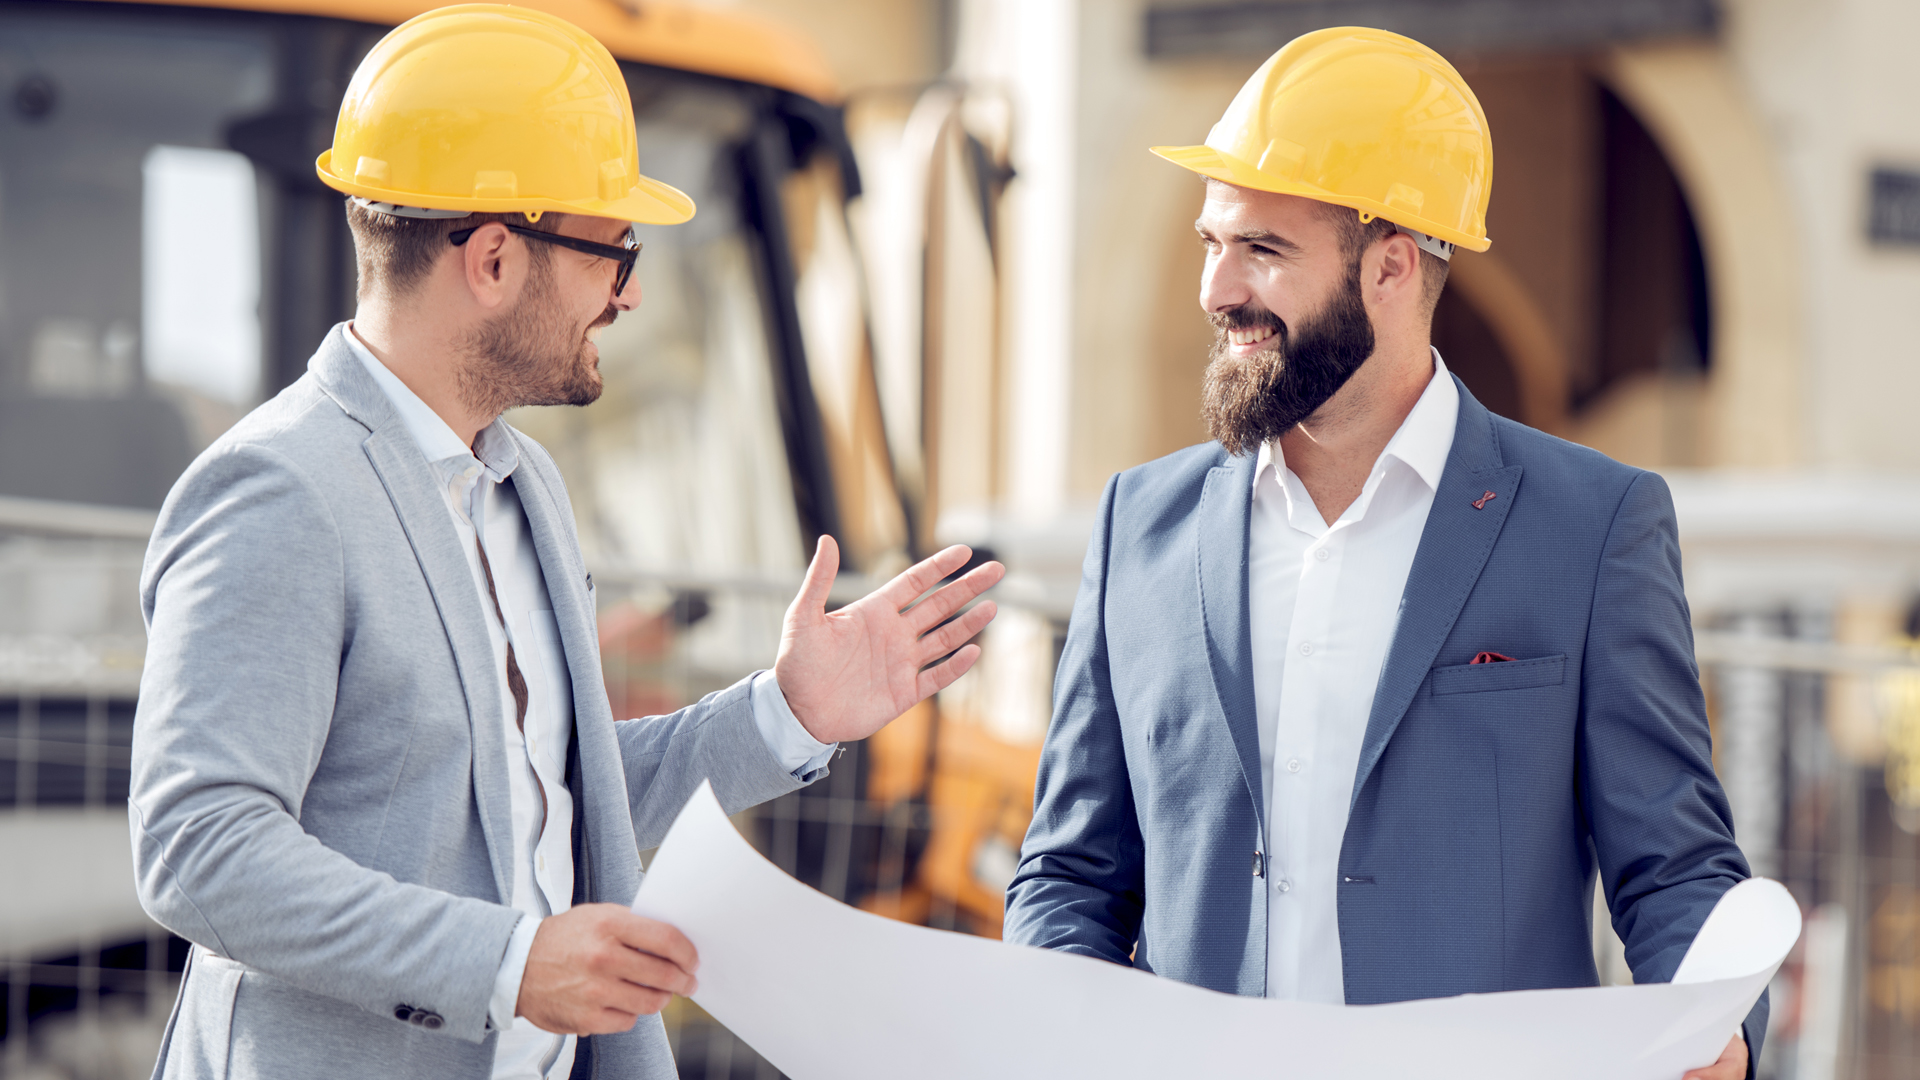 Two men planning